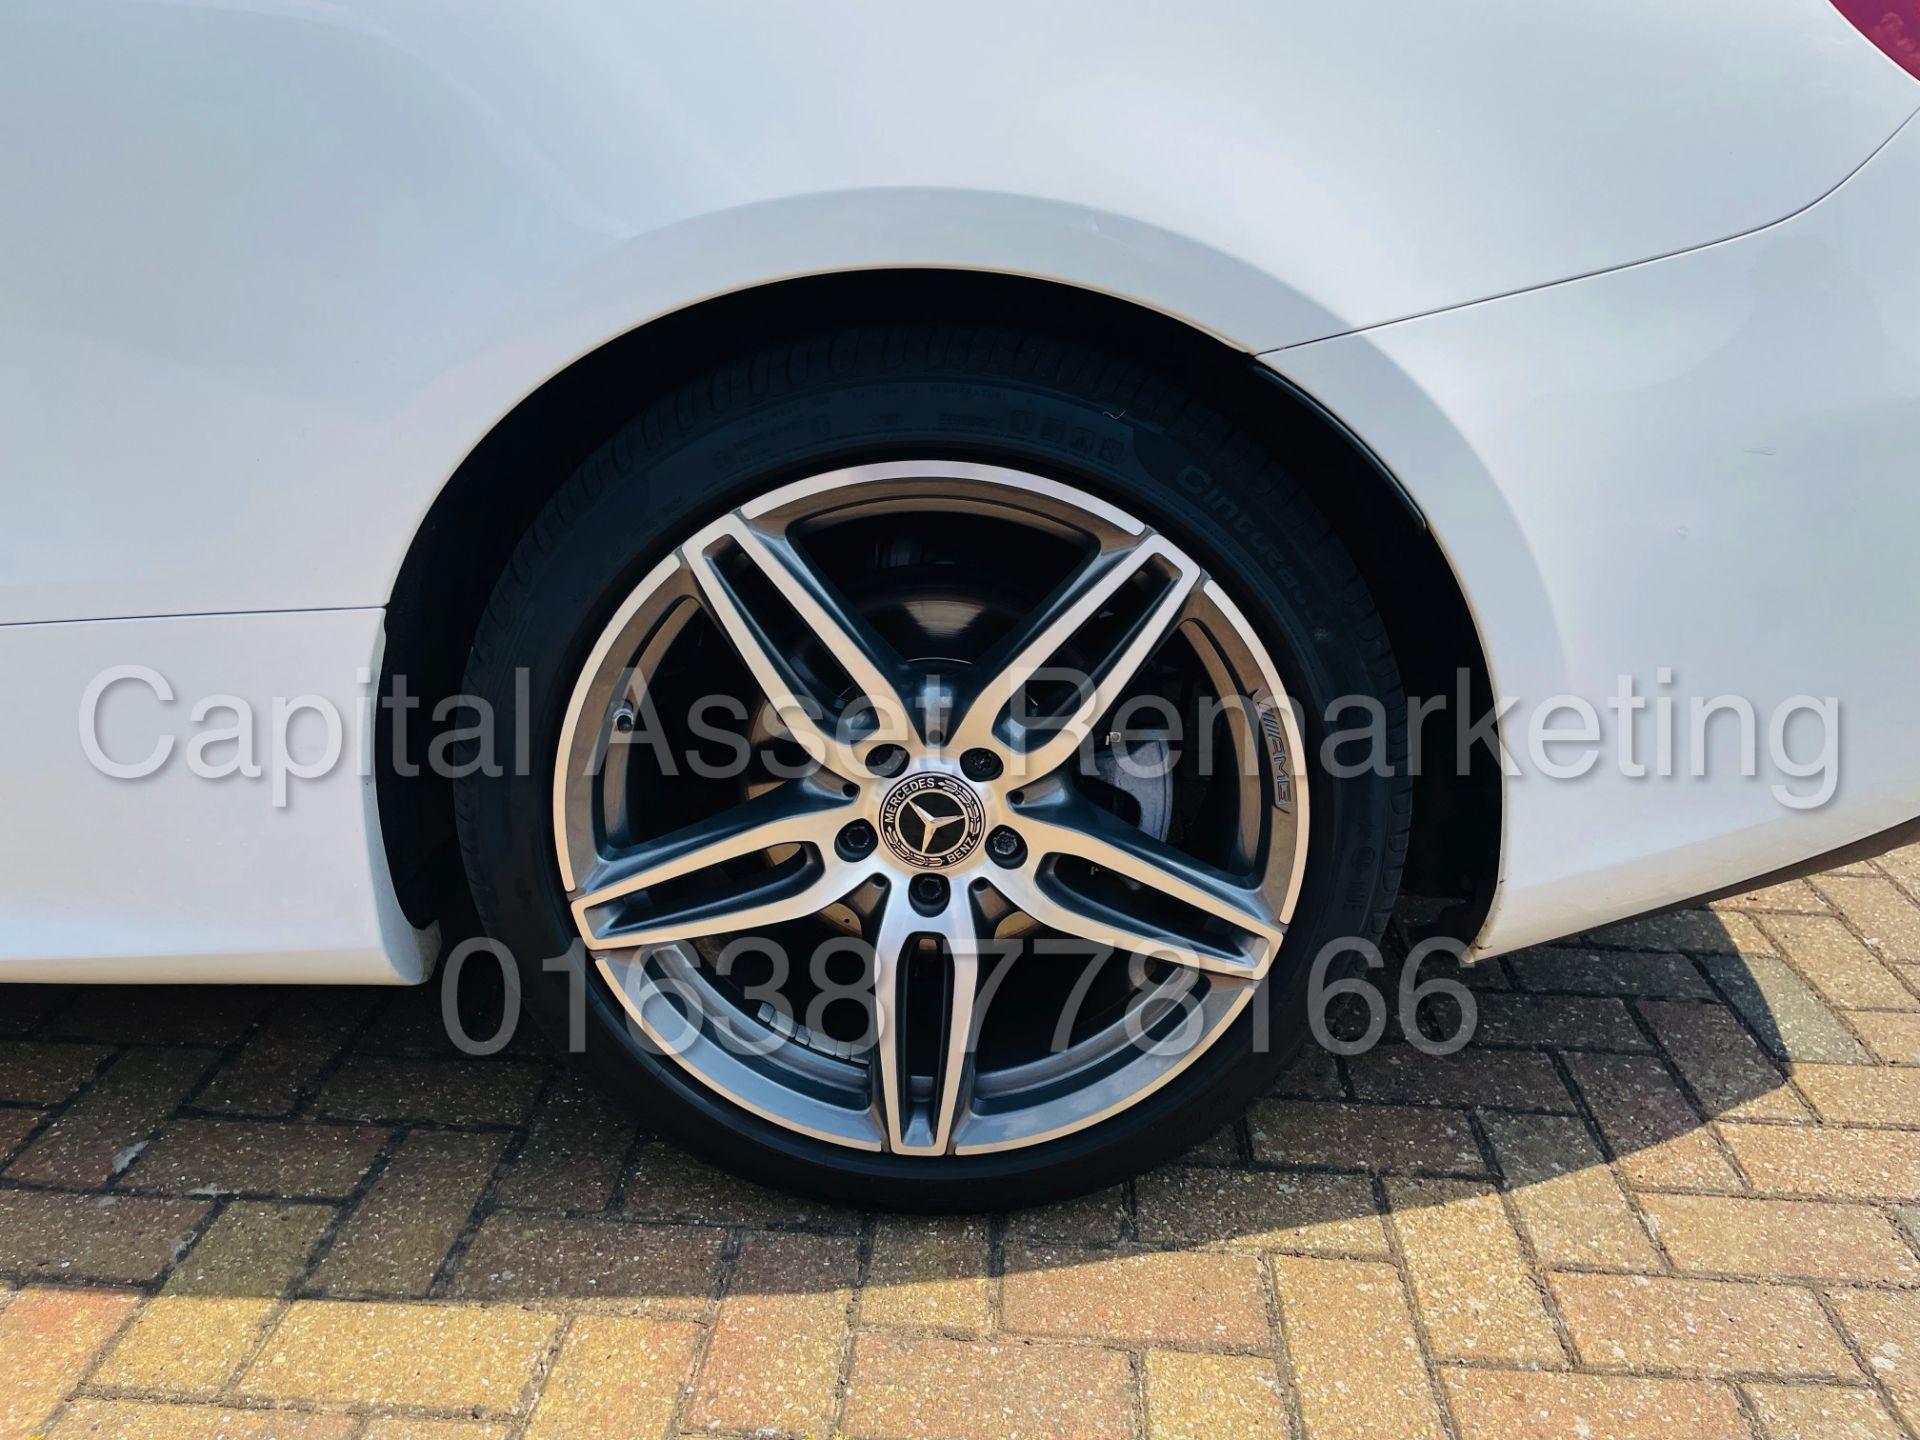 MERCEDES-BENZ E220d *AMG LINE PREMIUM - CABRIOLET* (2018 - EURO 6) '9G AUTO - LEATHER - SAT NAV' - Image 34 of 63